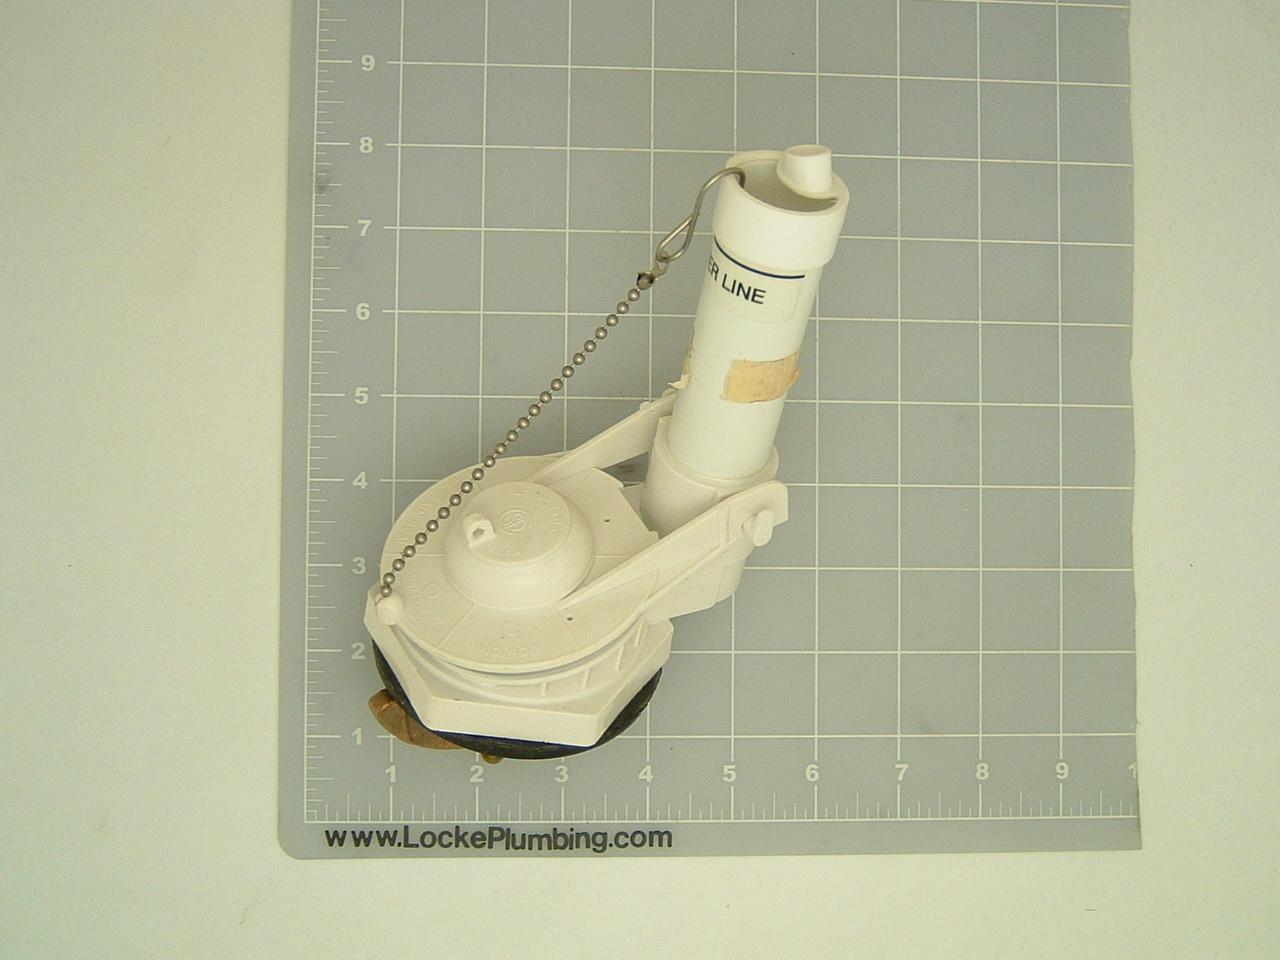 Universal Rundle Flush Valve 246 Locke Plumbing